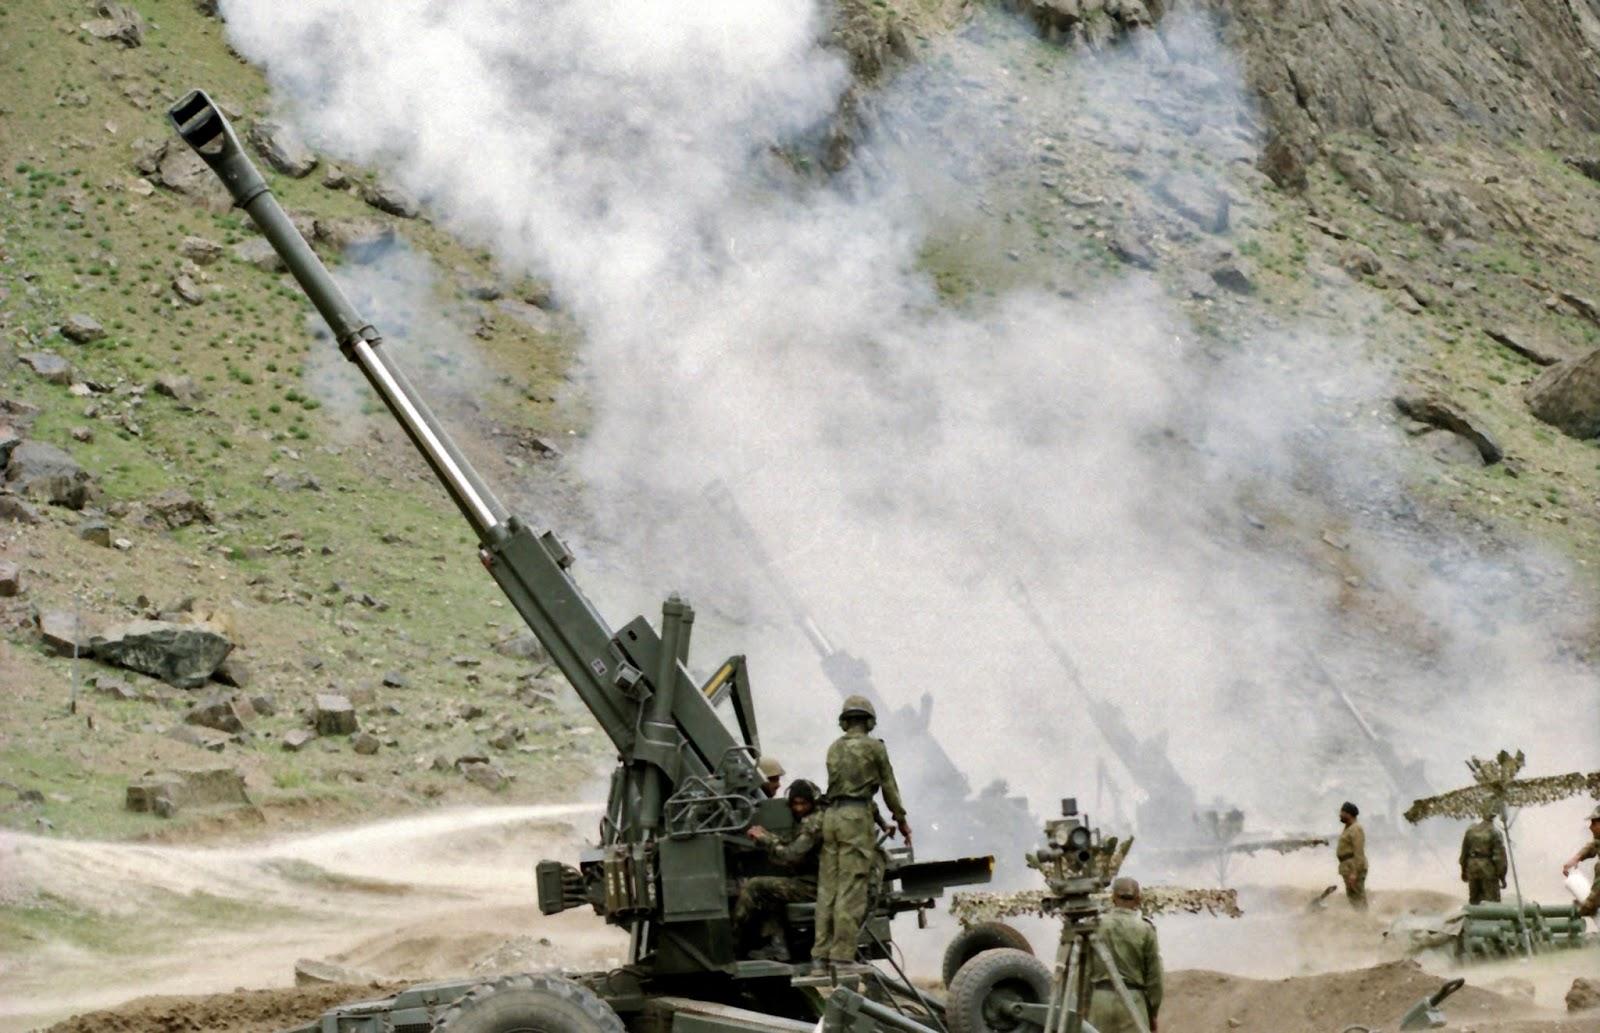 memories of kargil war through kashmir lens point blank memories of kargil war through kashmir lens